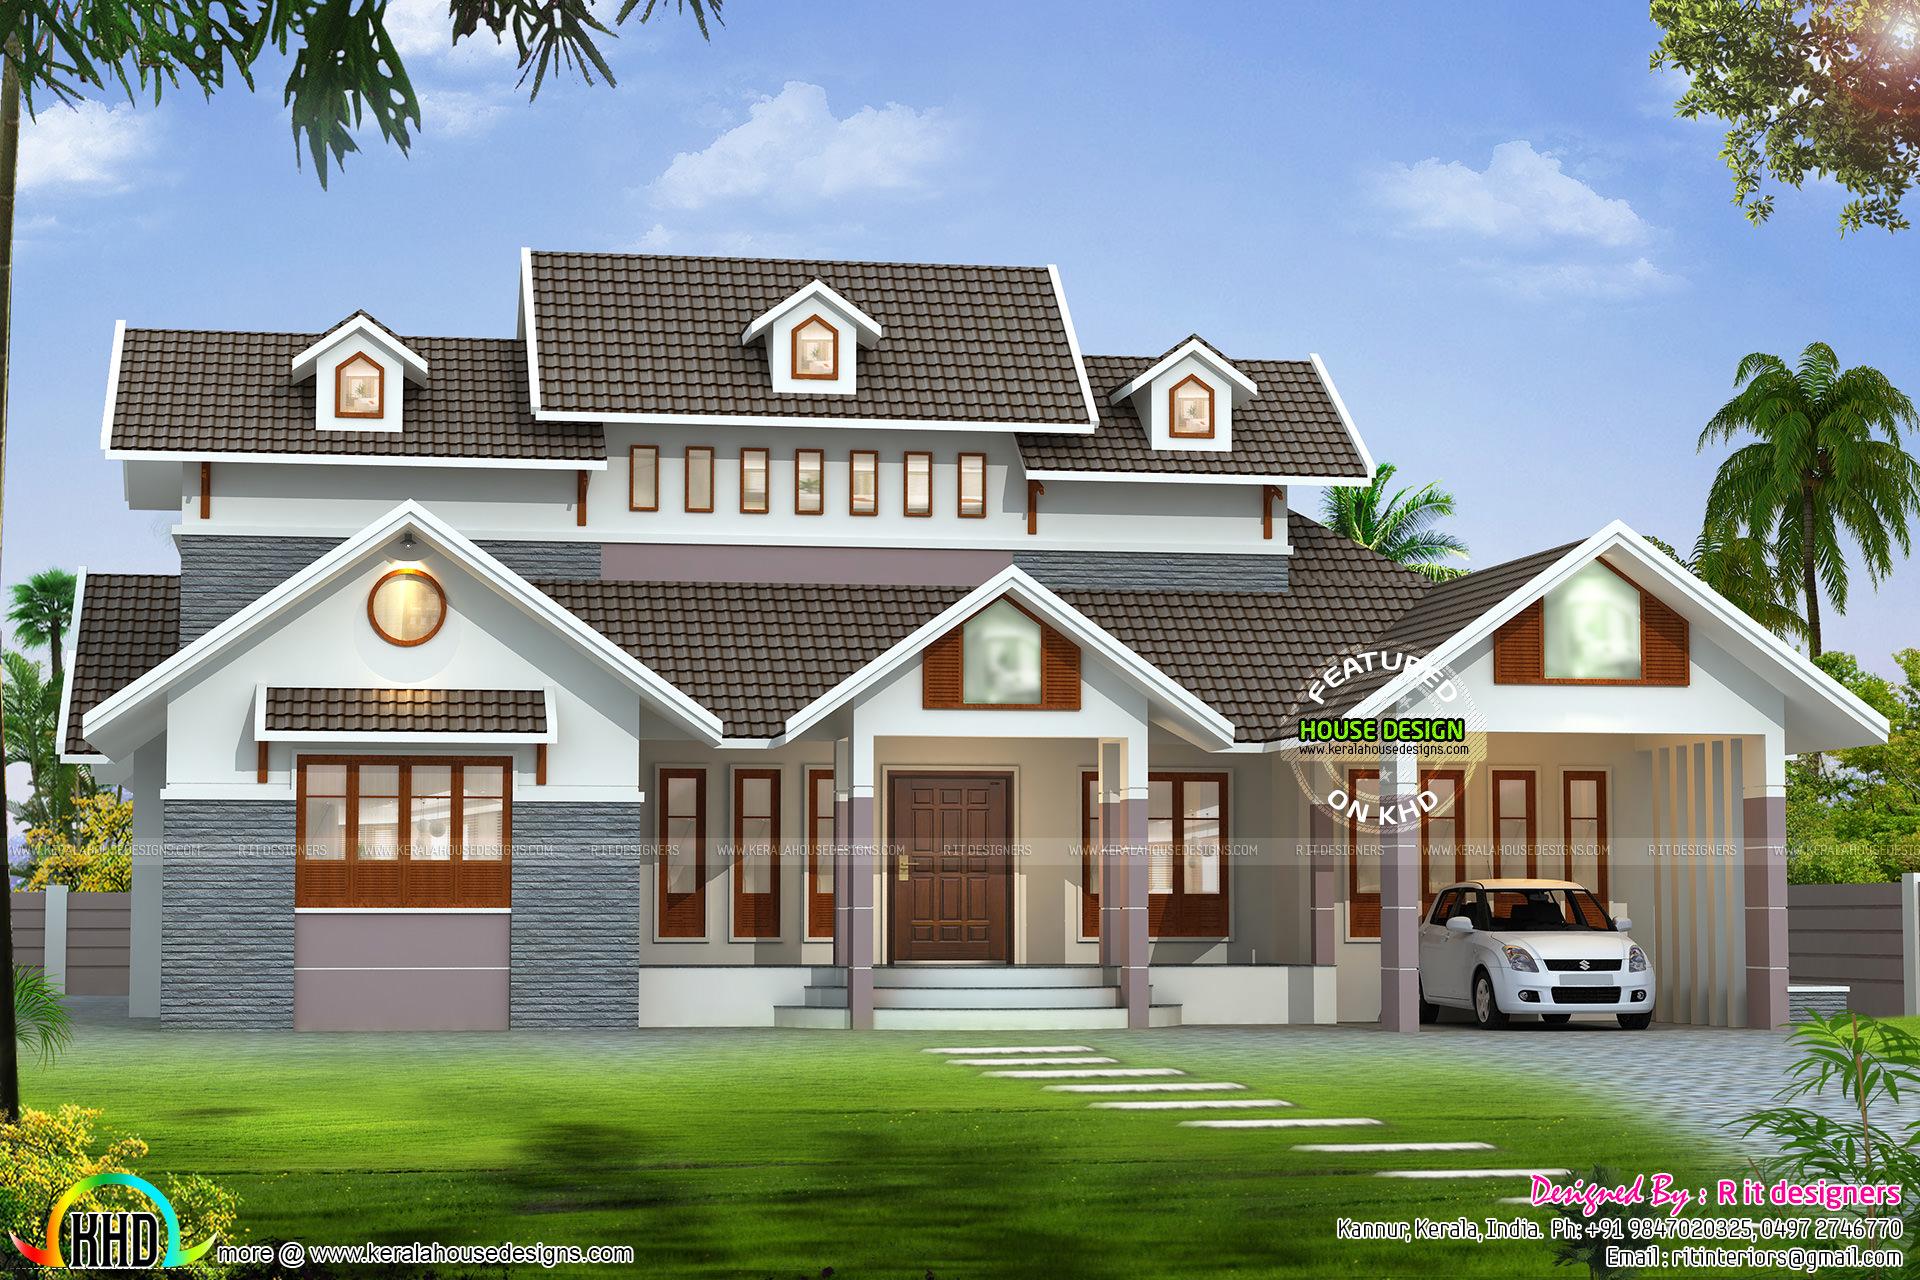 See floor plans read more please follow kerala home design - House Details Read More Please Follow Kerala Home Design